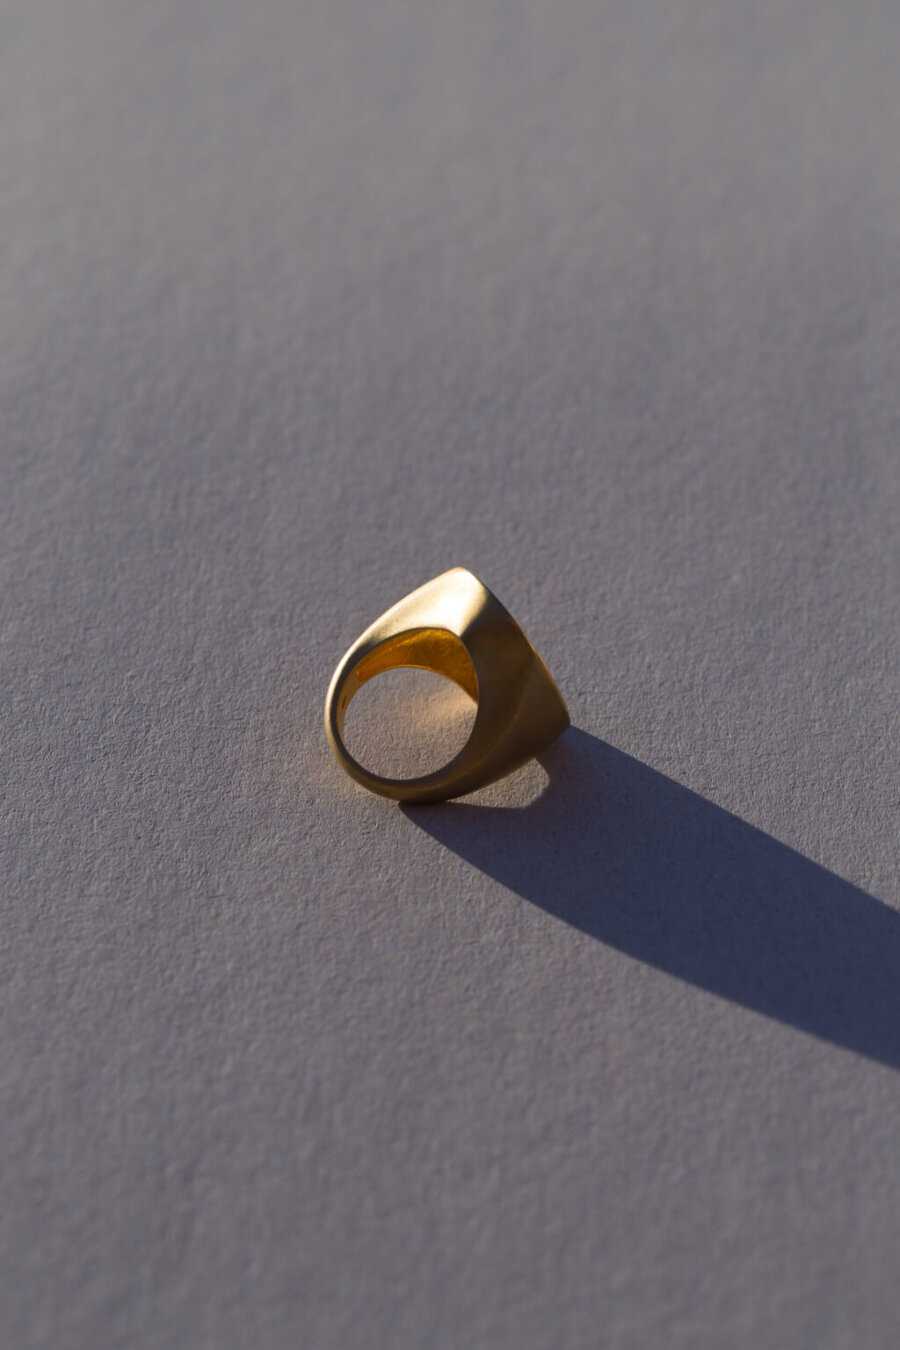 the-maxi-signet-ring-by-glenda-lopez-alta